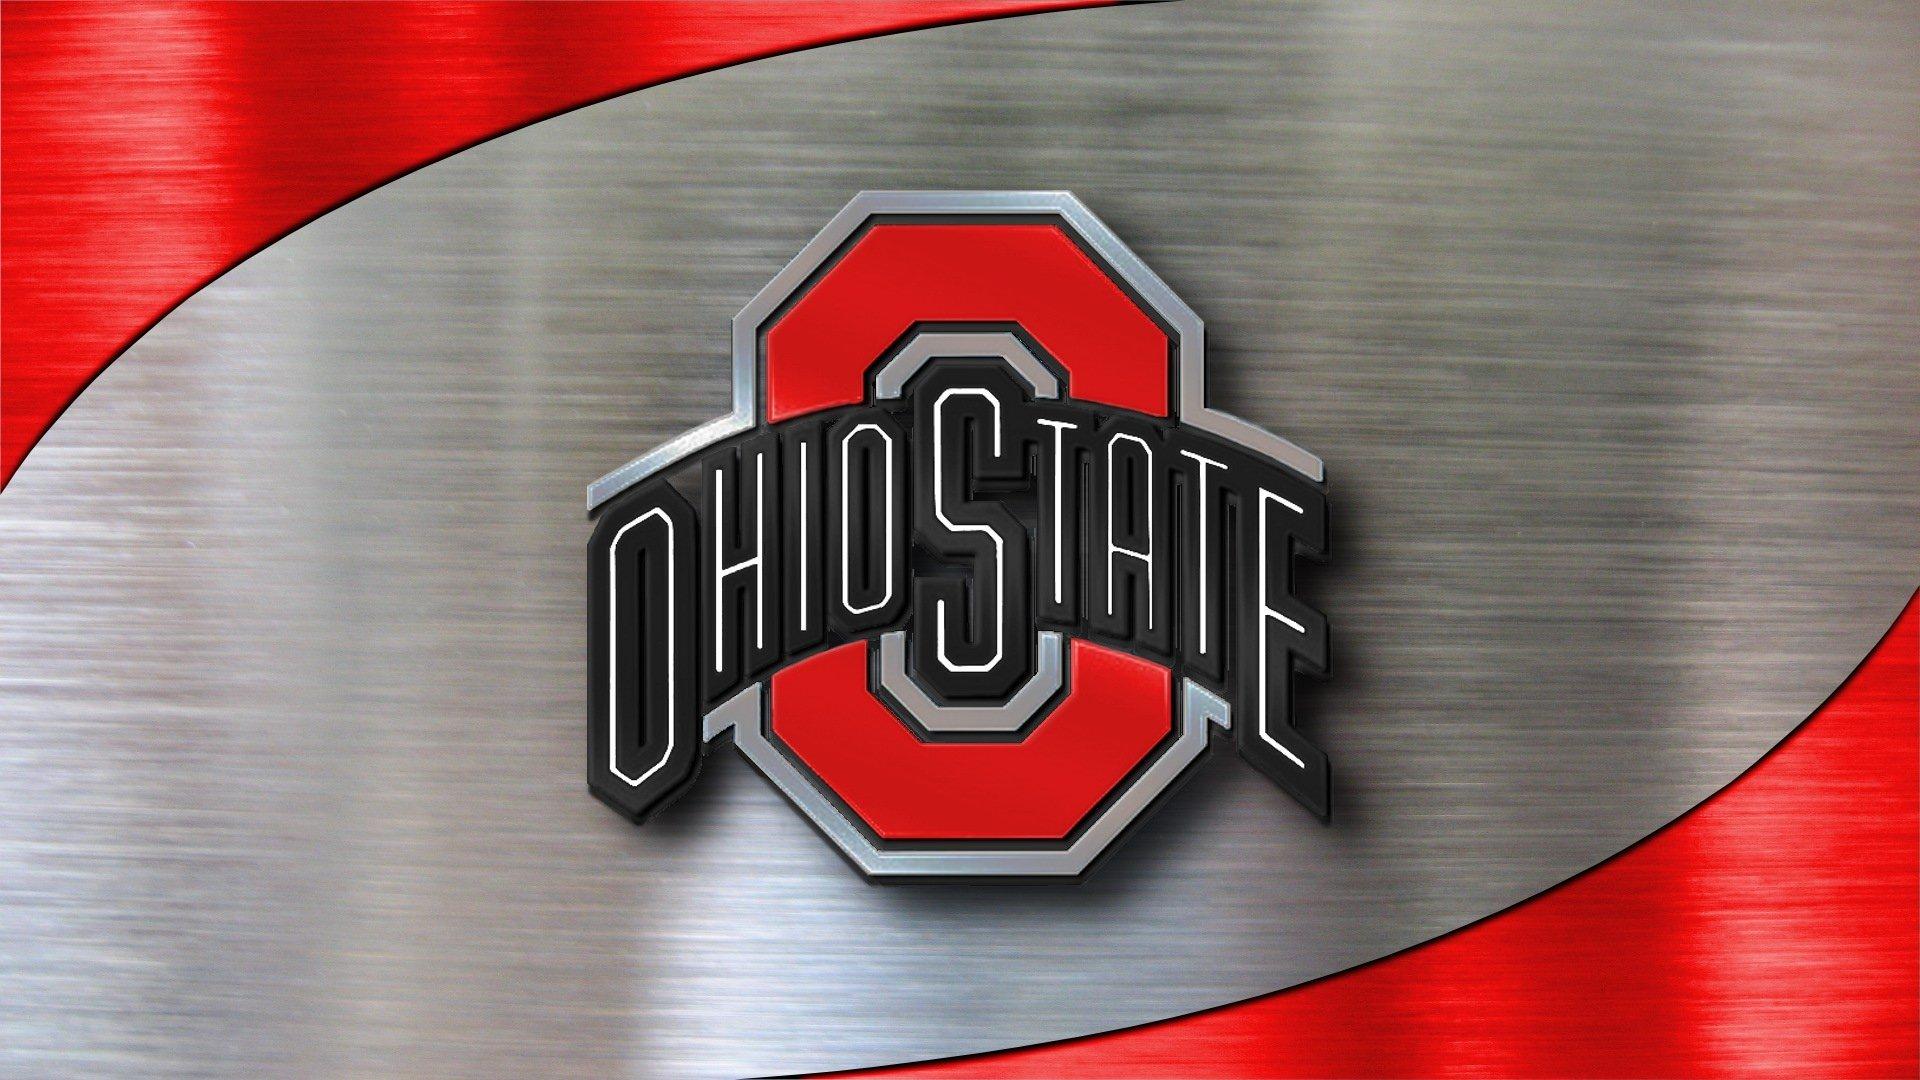 OSU Wallpaper 423 - Ohio State Football Wallpaper (30925026) - Fanpop